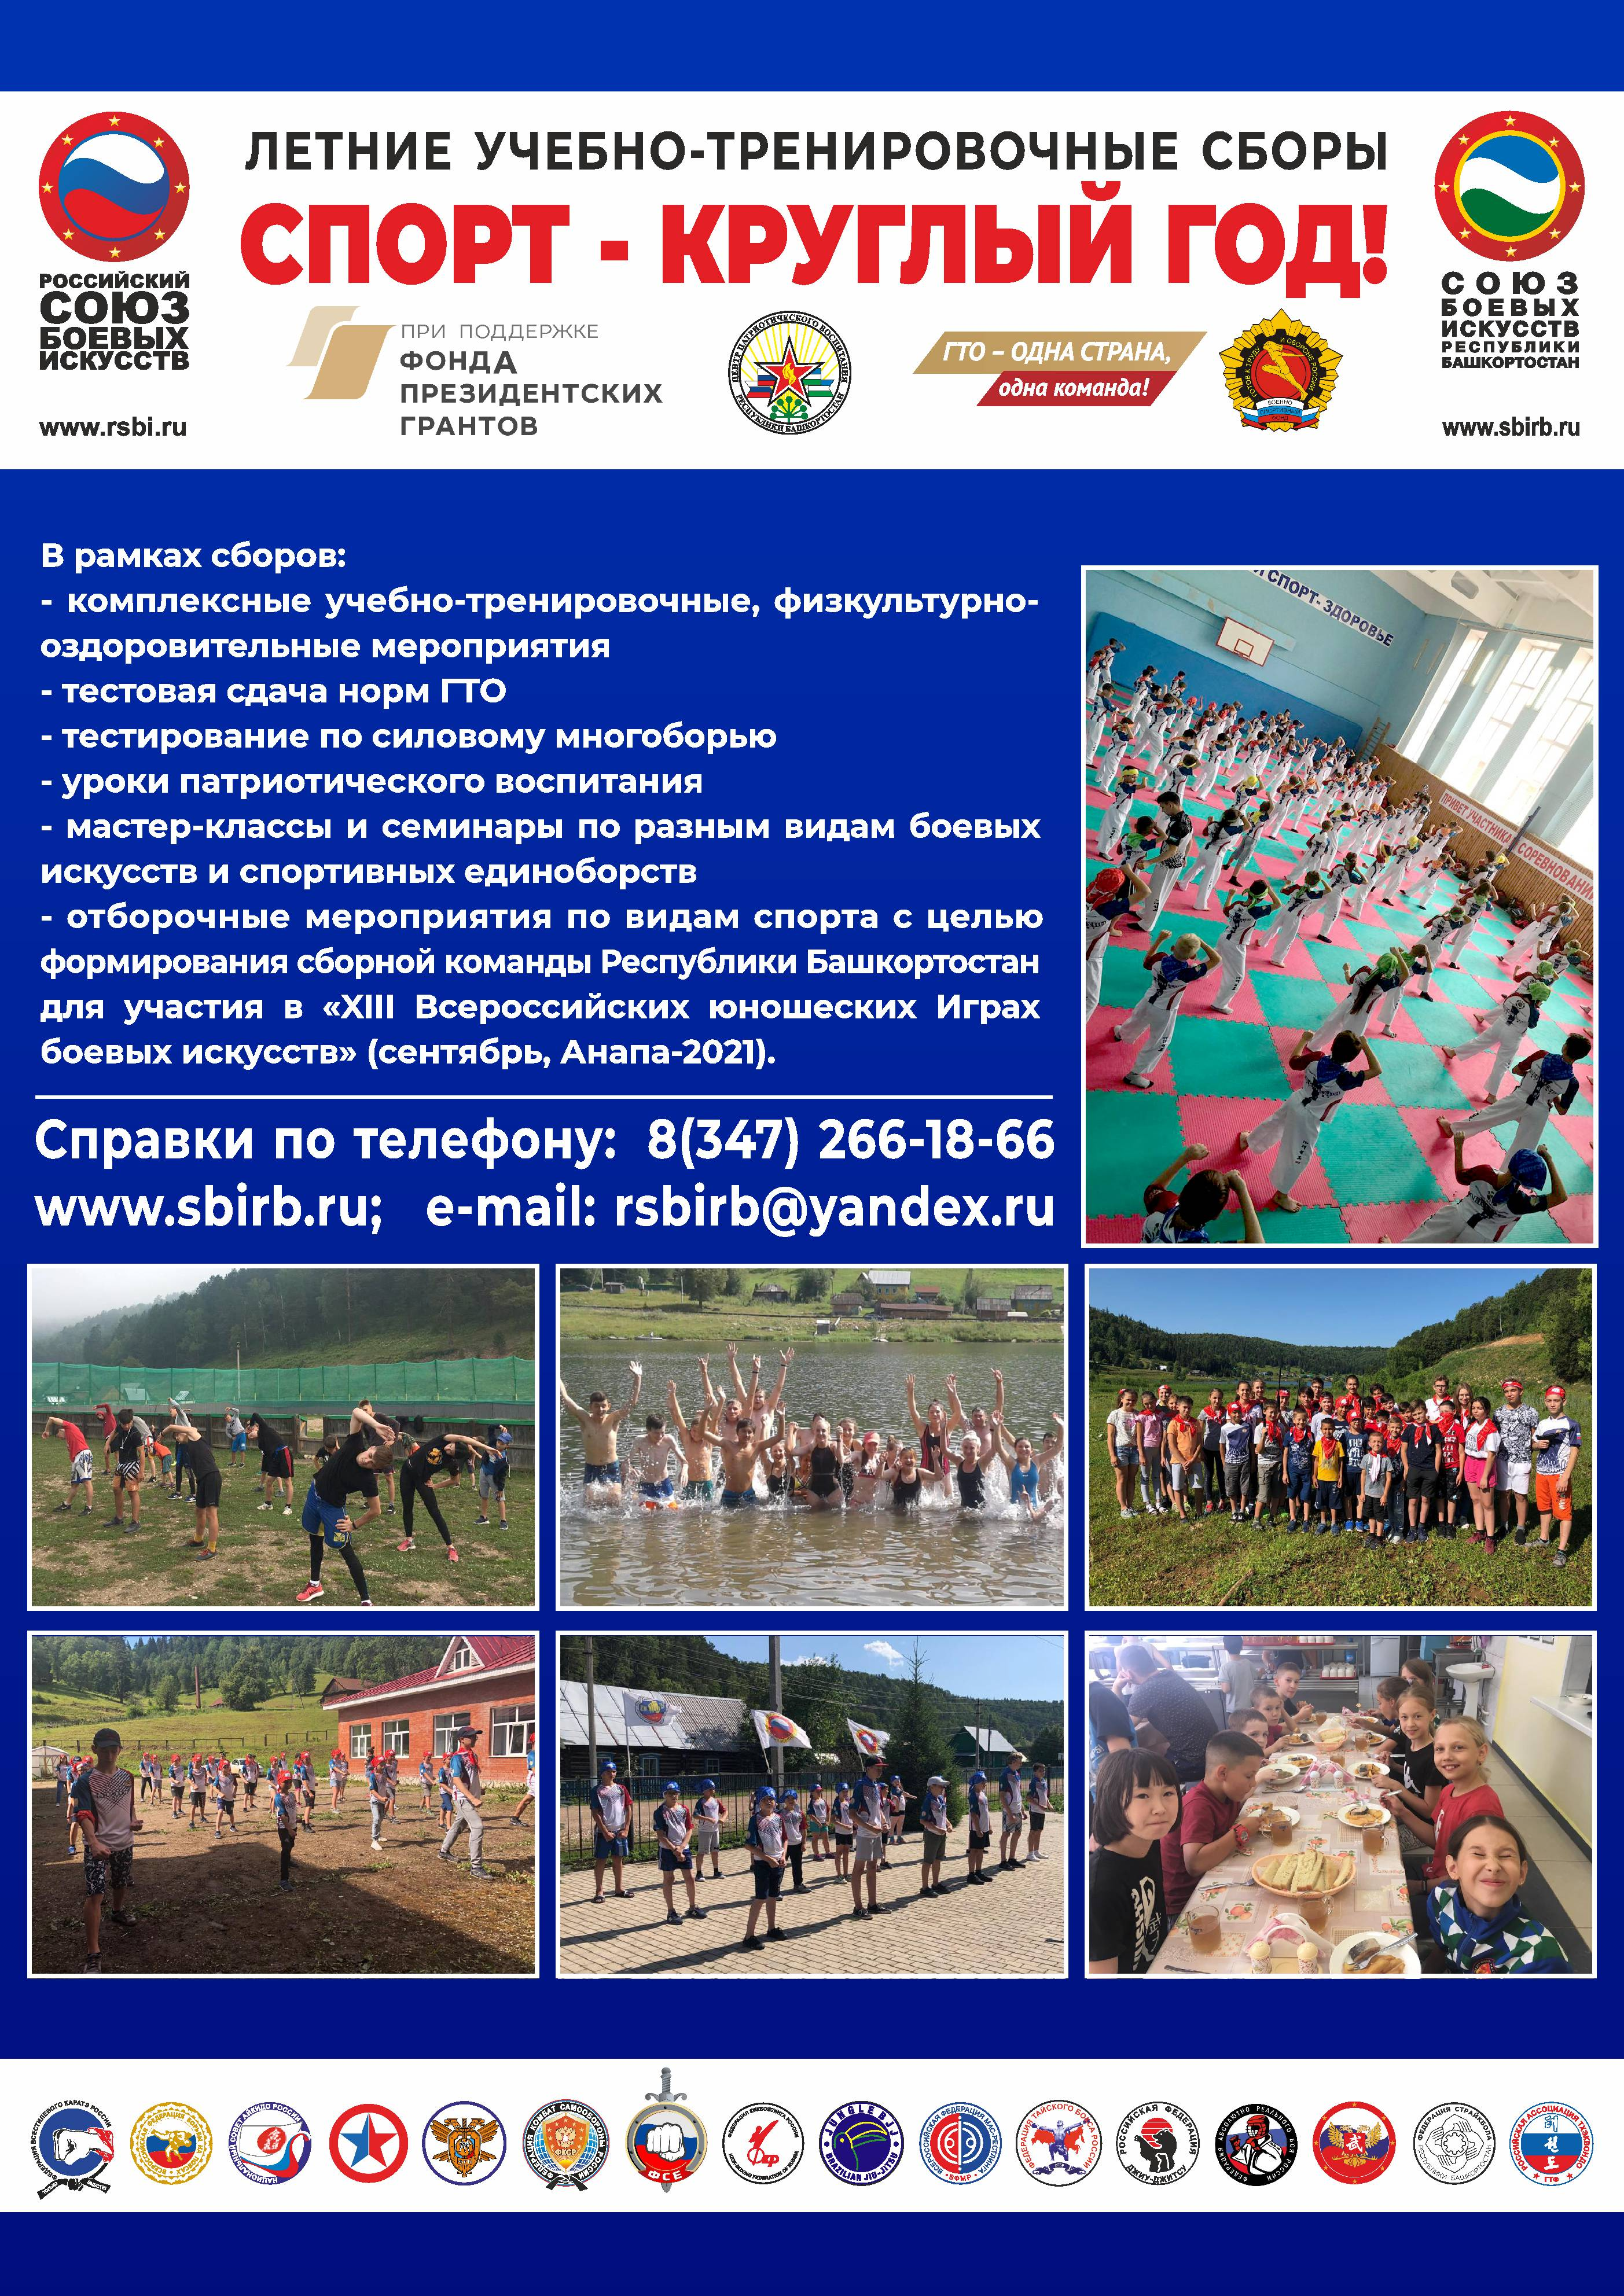 http://sbirb.combatsd.ru/images/upload/афиша%20сборы-2021.jpg